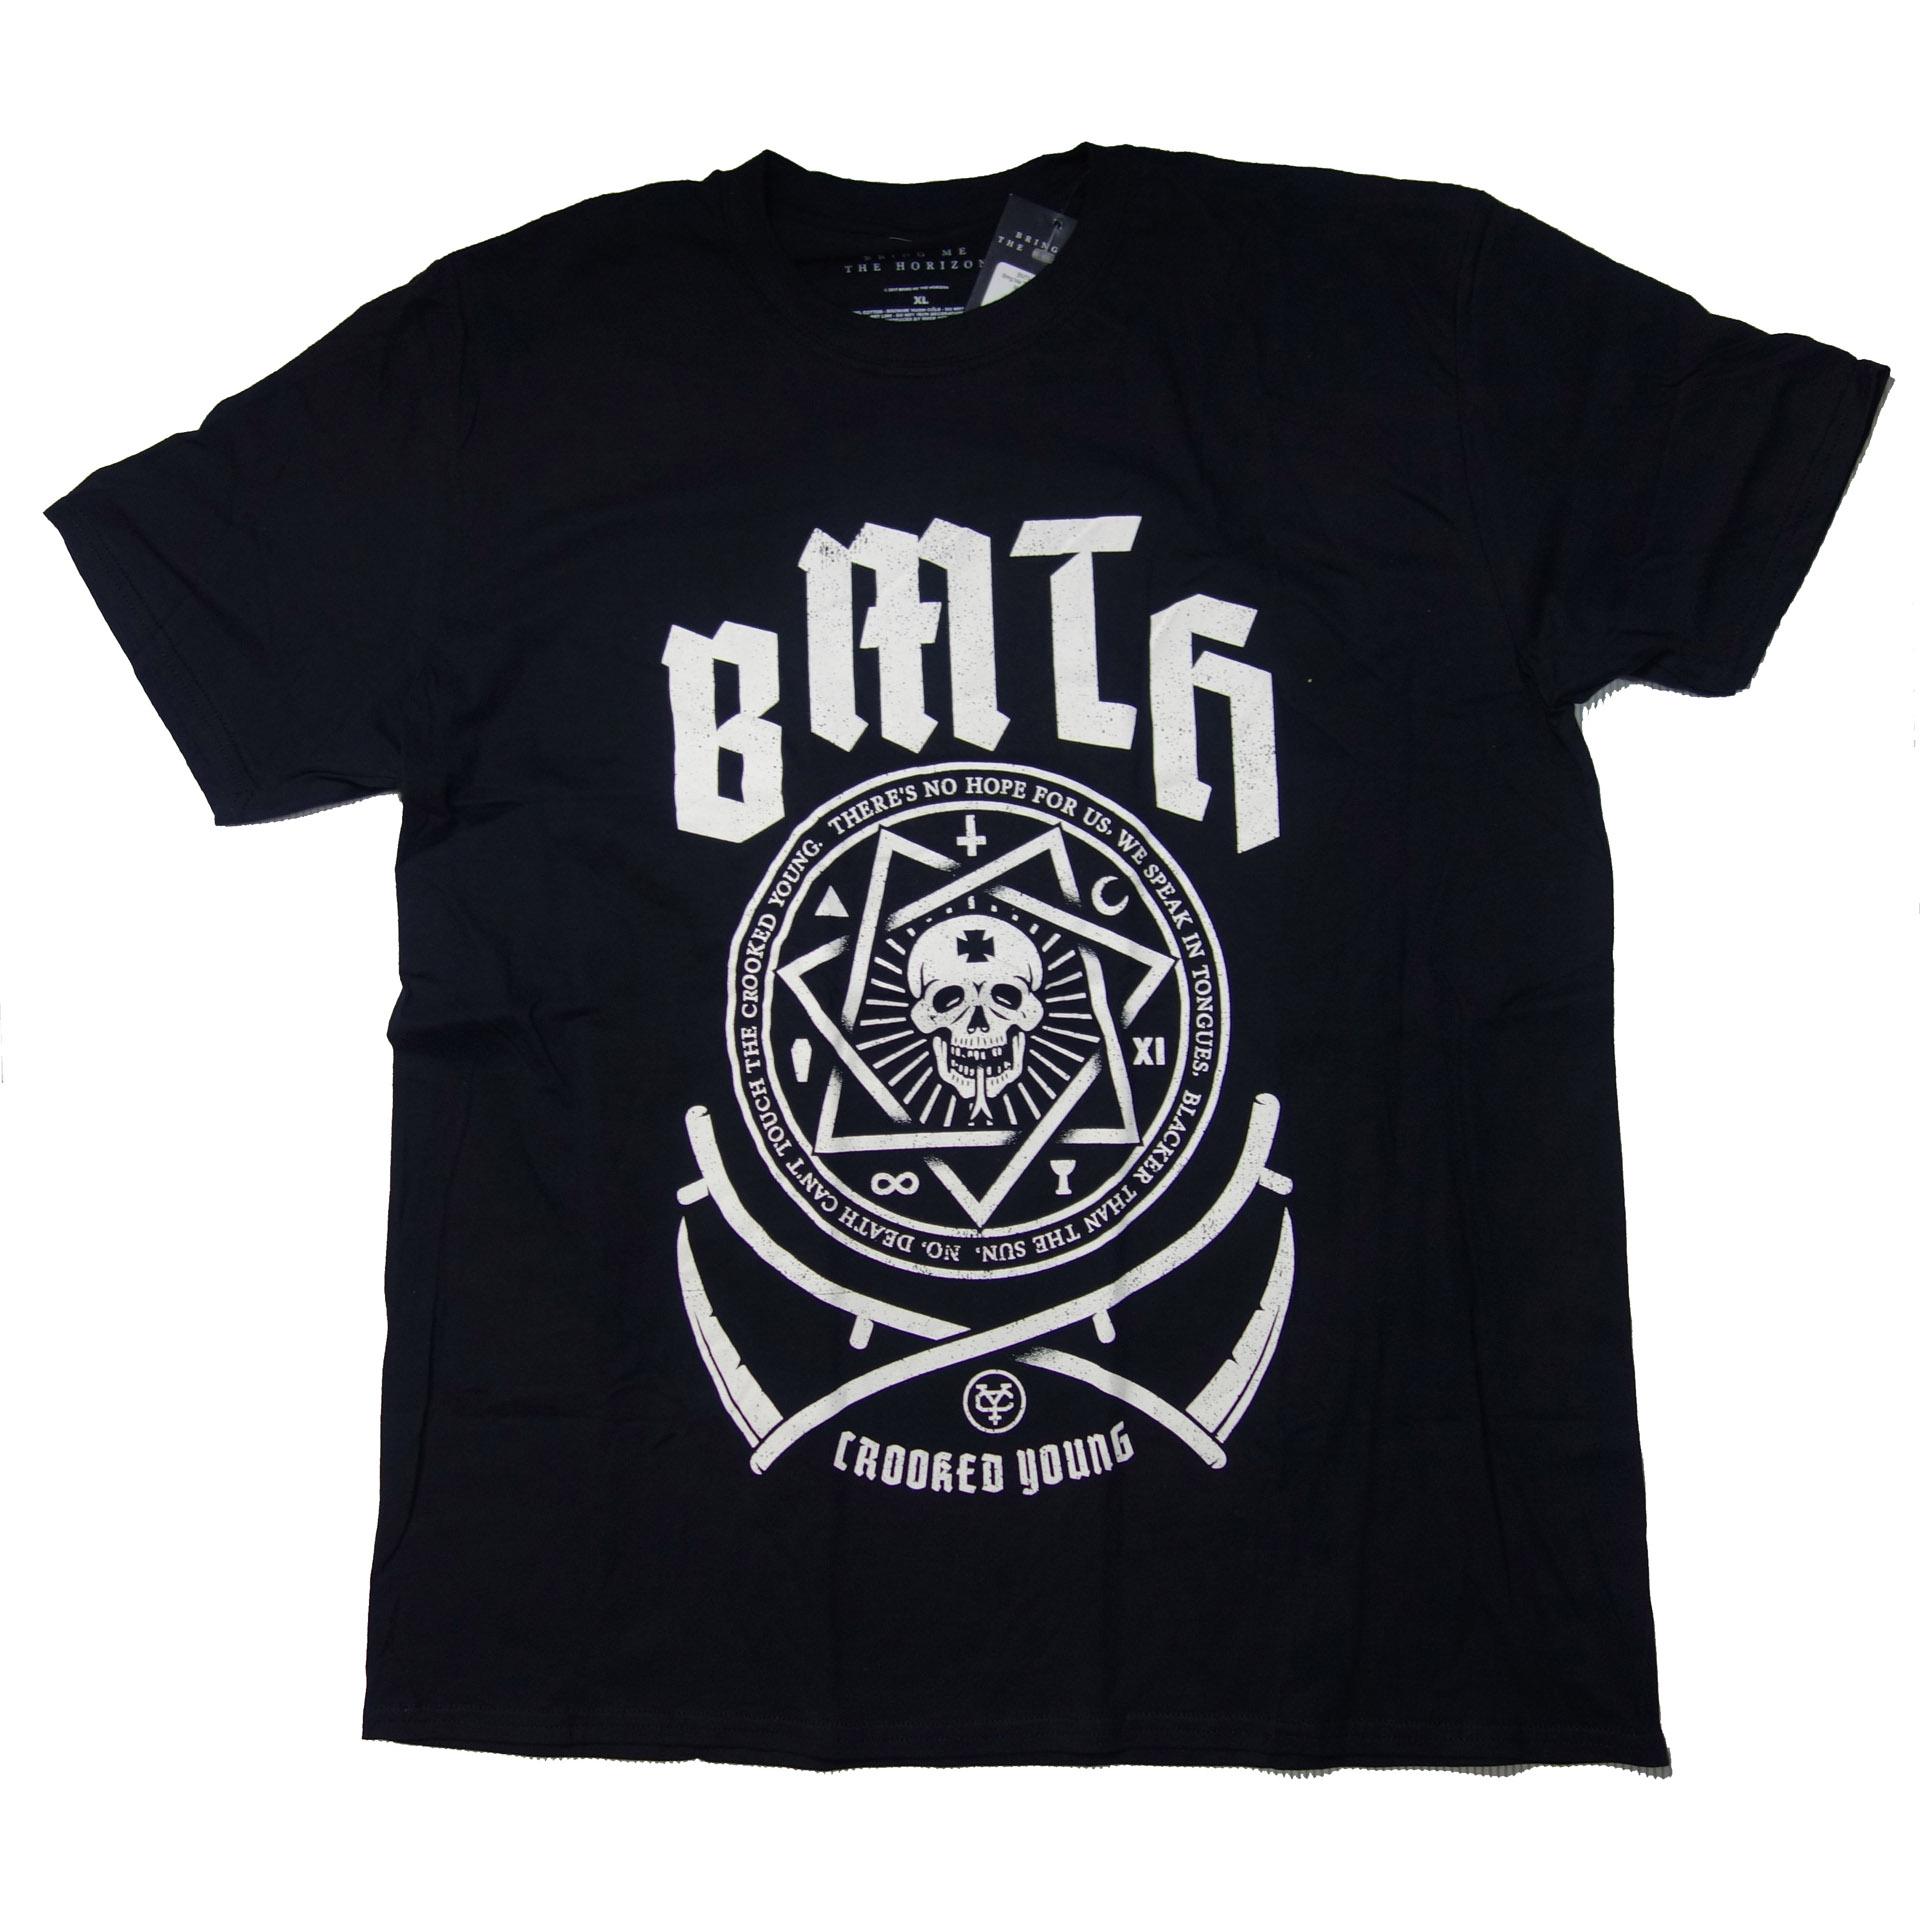 T-Shirt Bring Me The Horizon Crooked